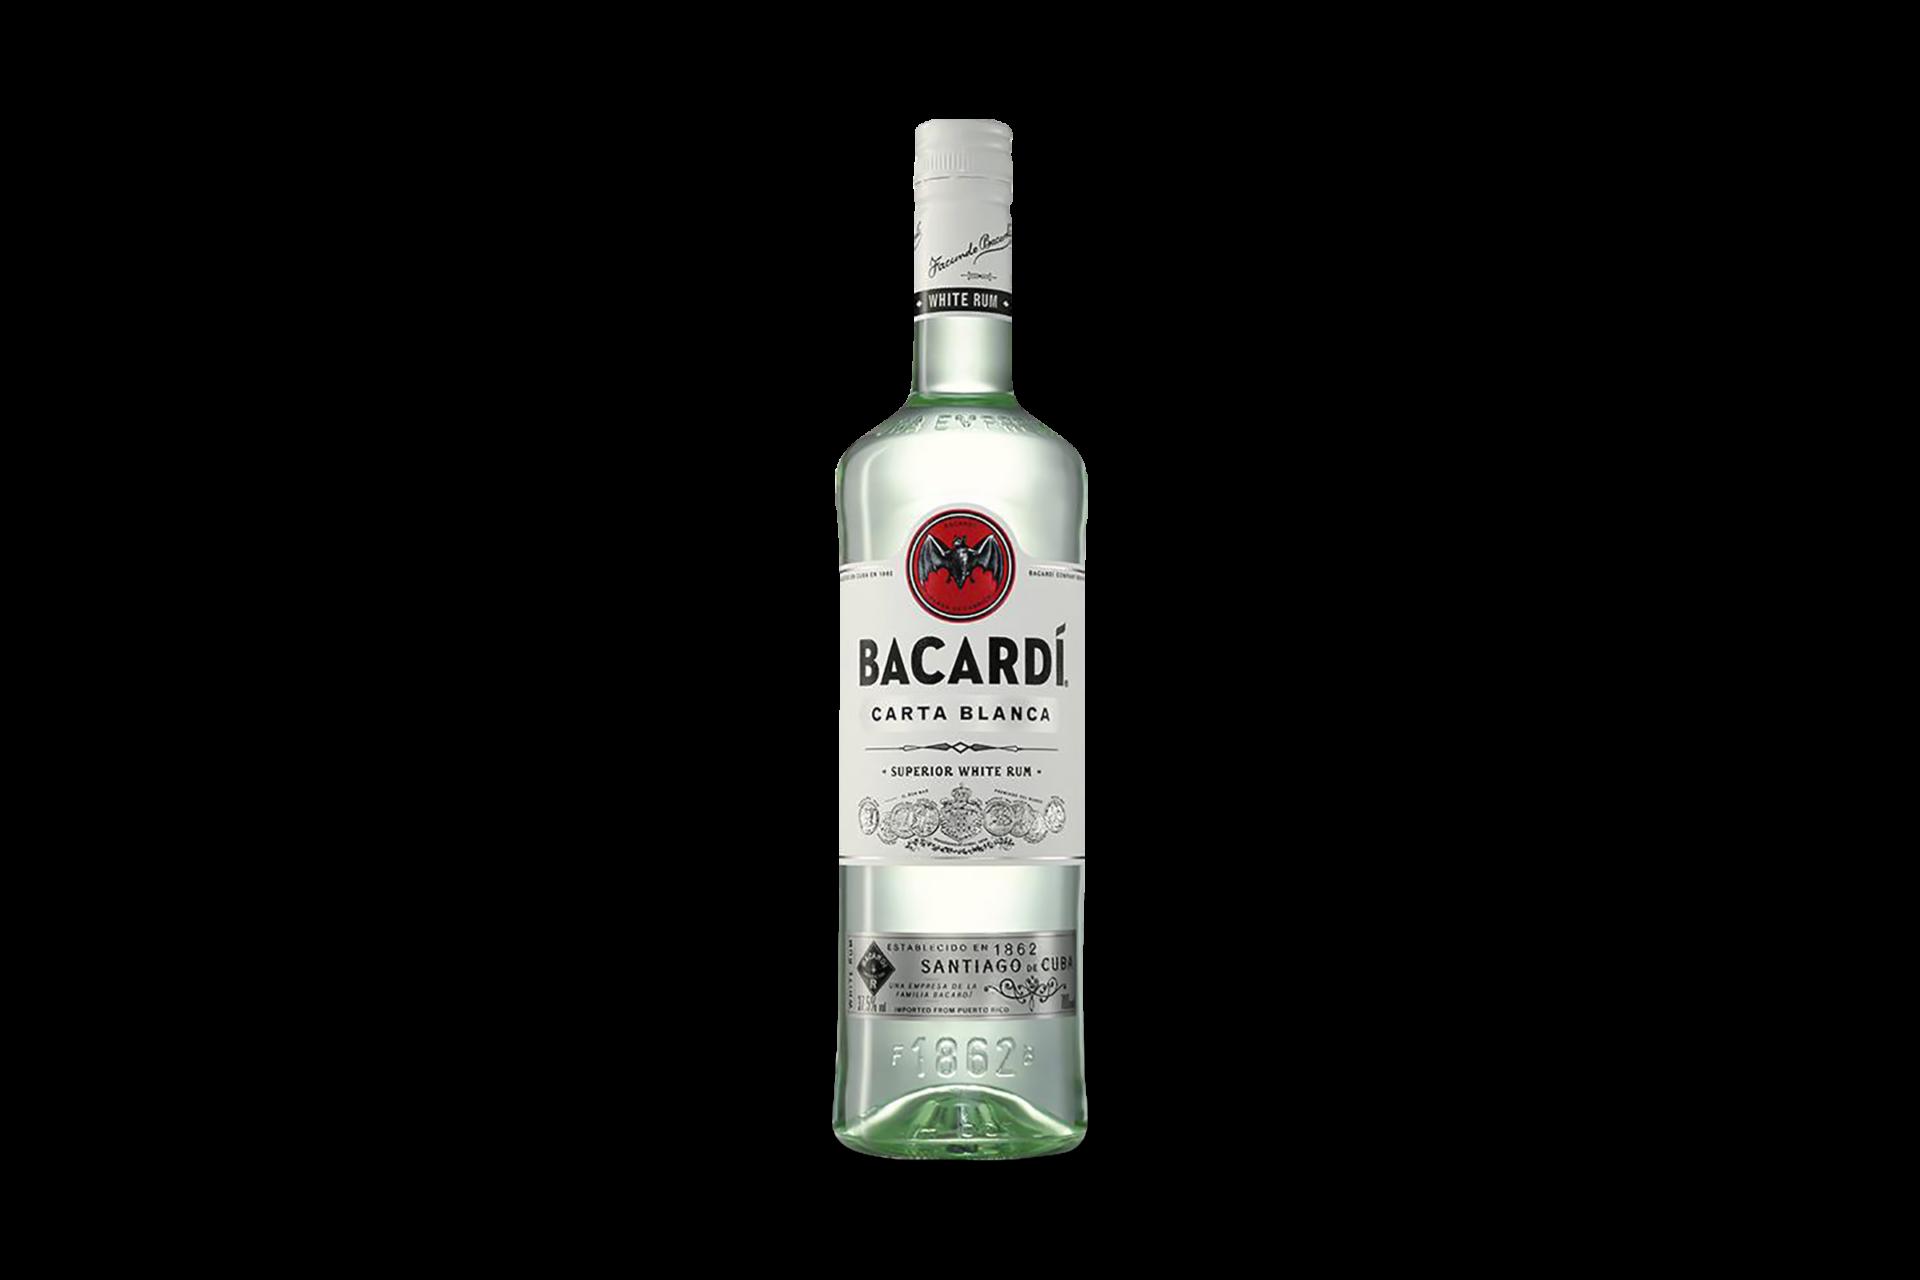 Bacardi Carta Blanca 0.7 l 1